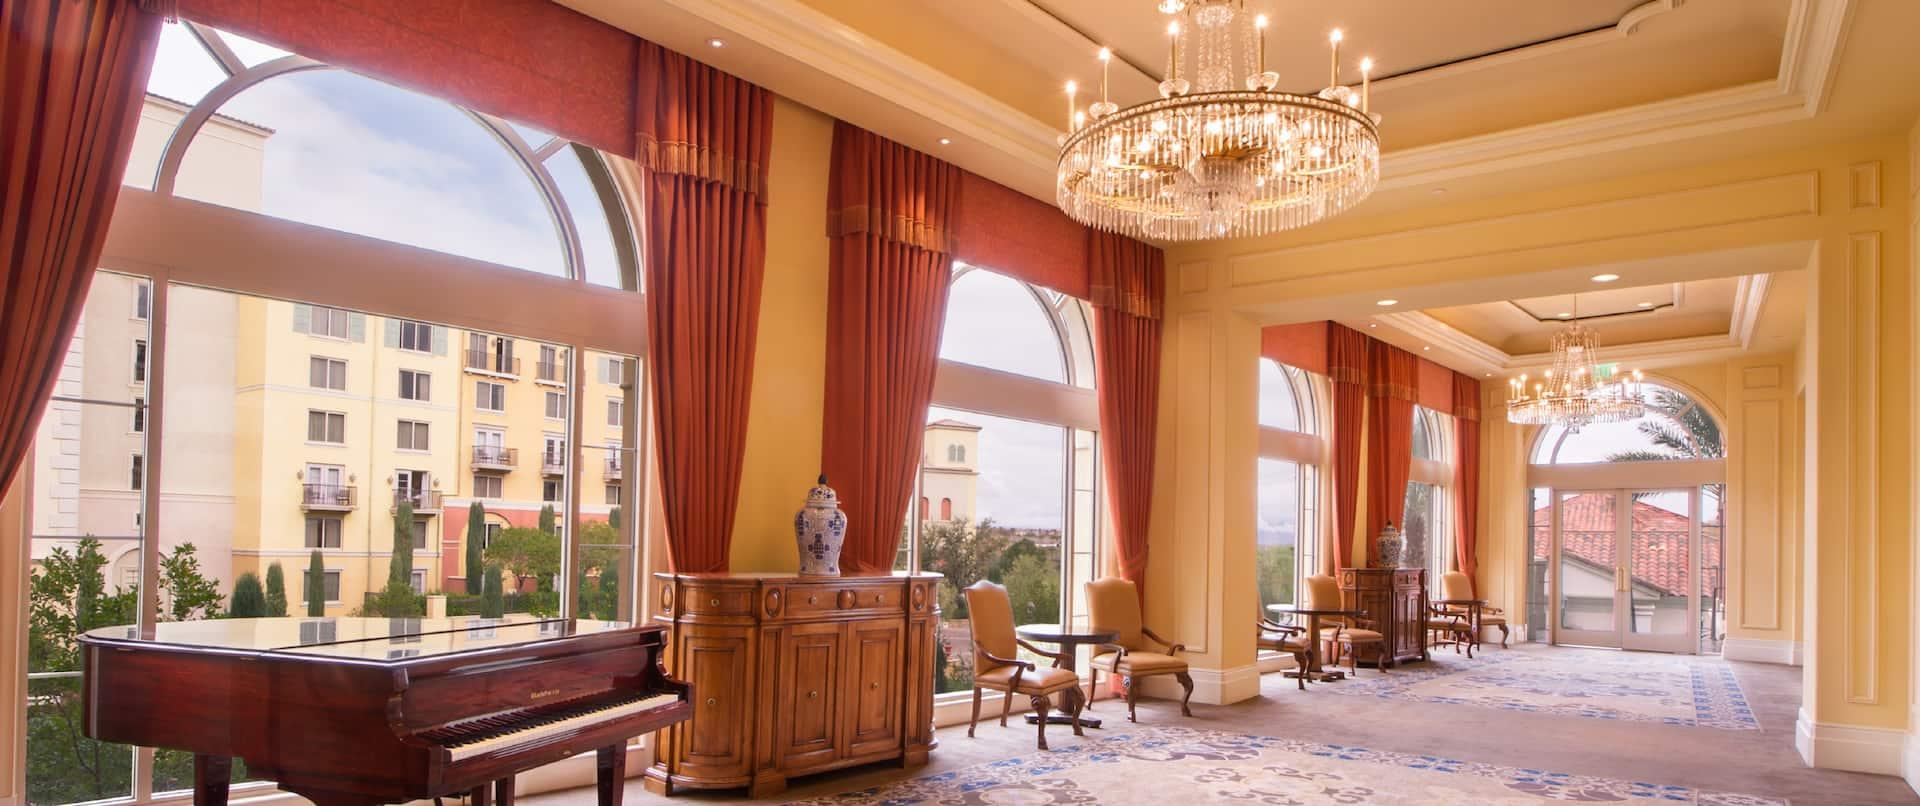 Ballroom Hallway With Piano